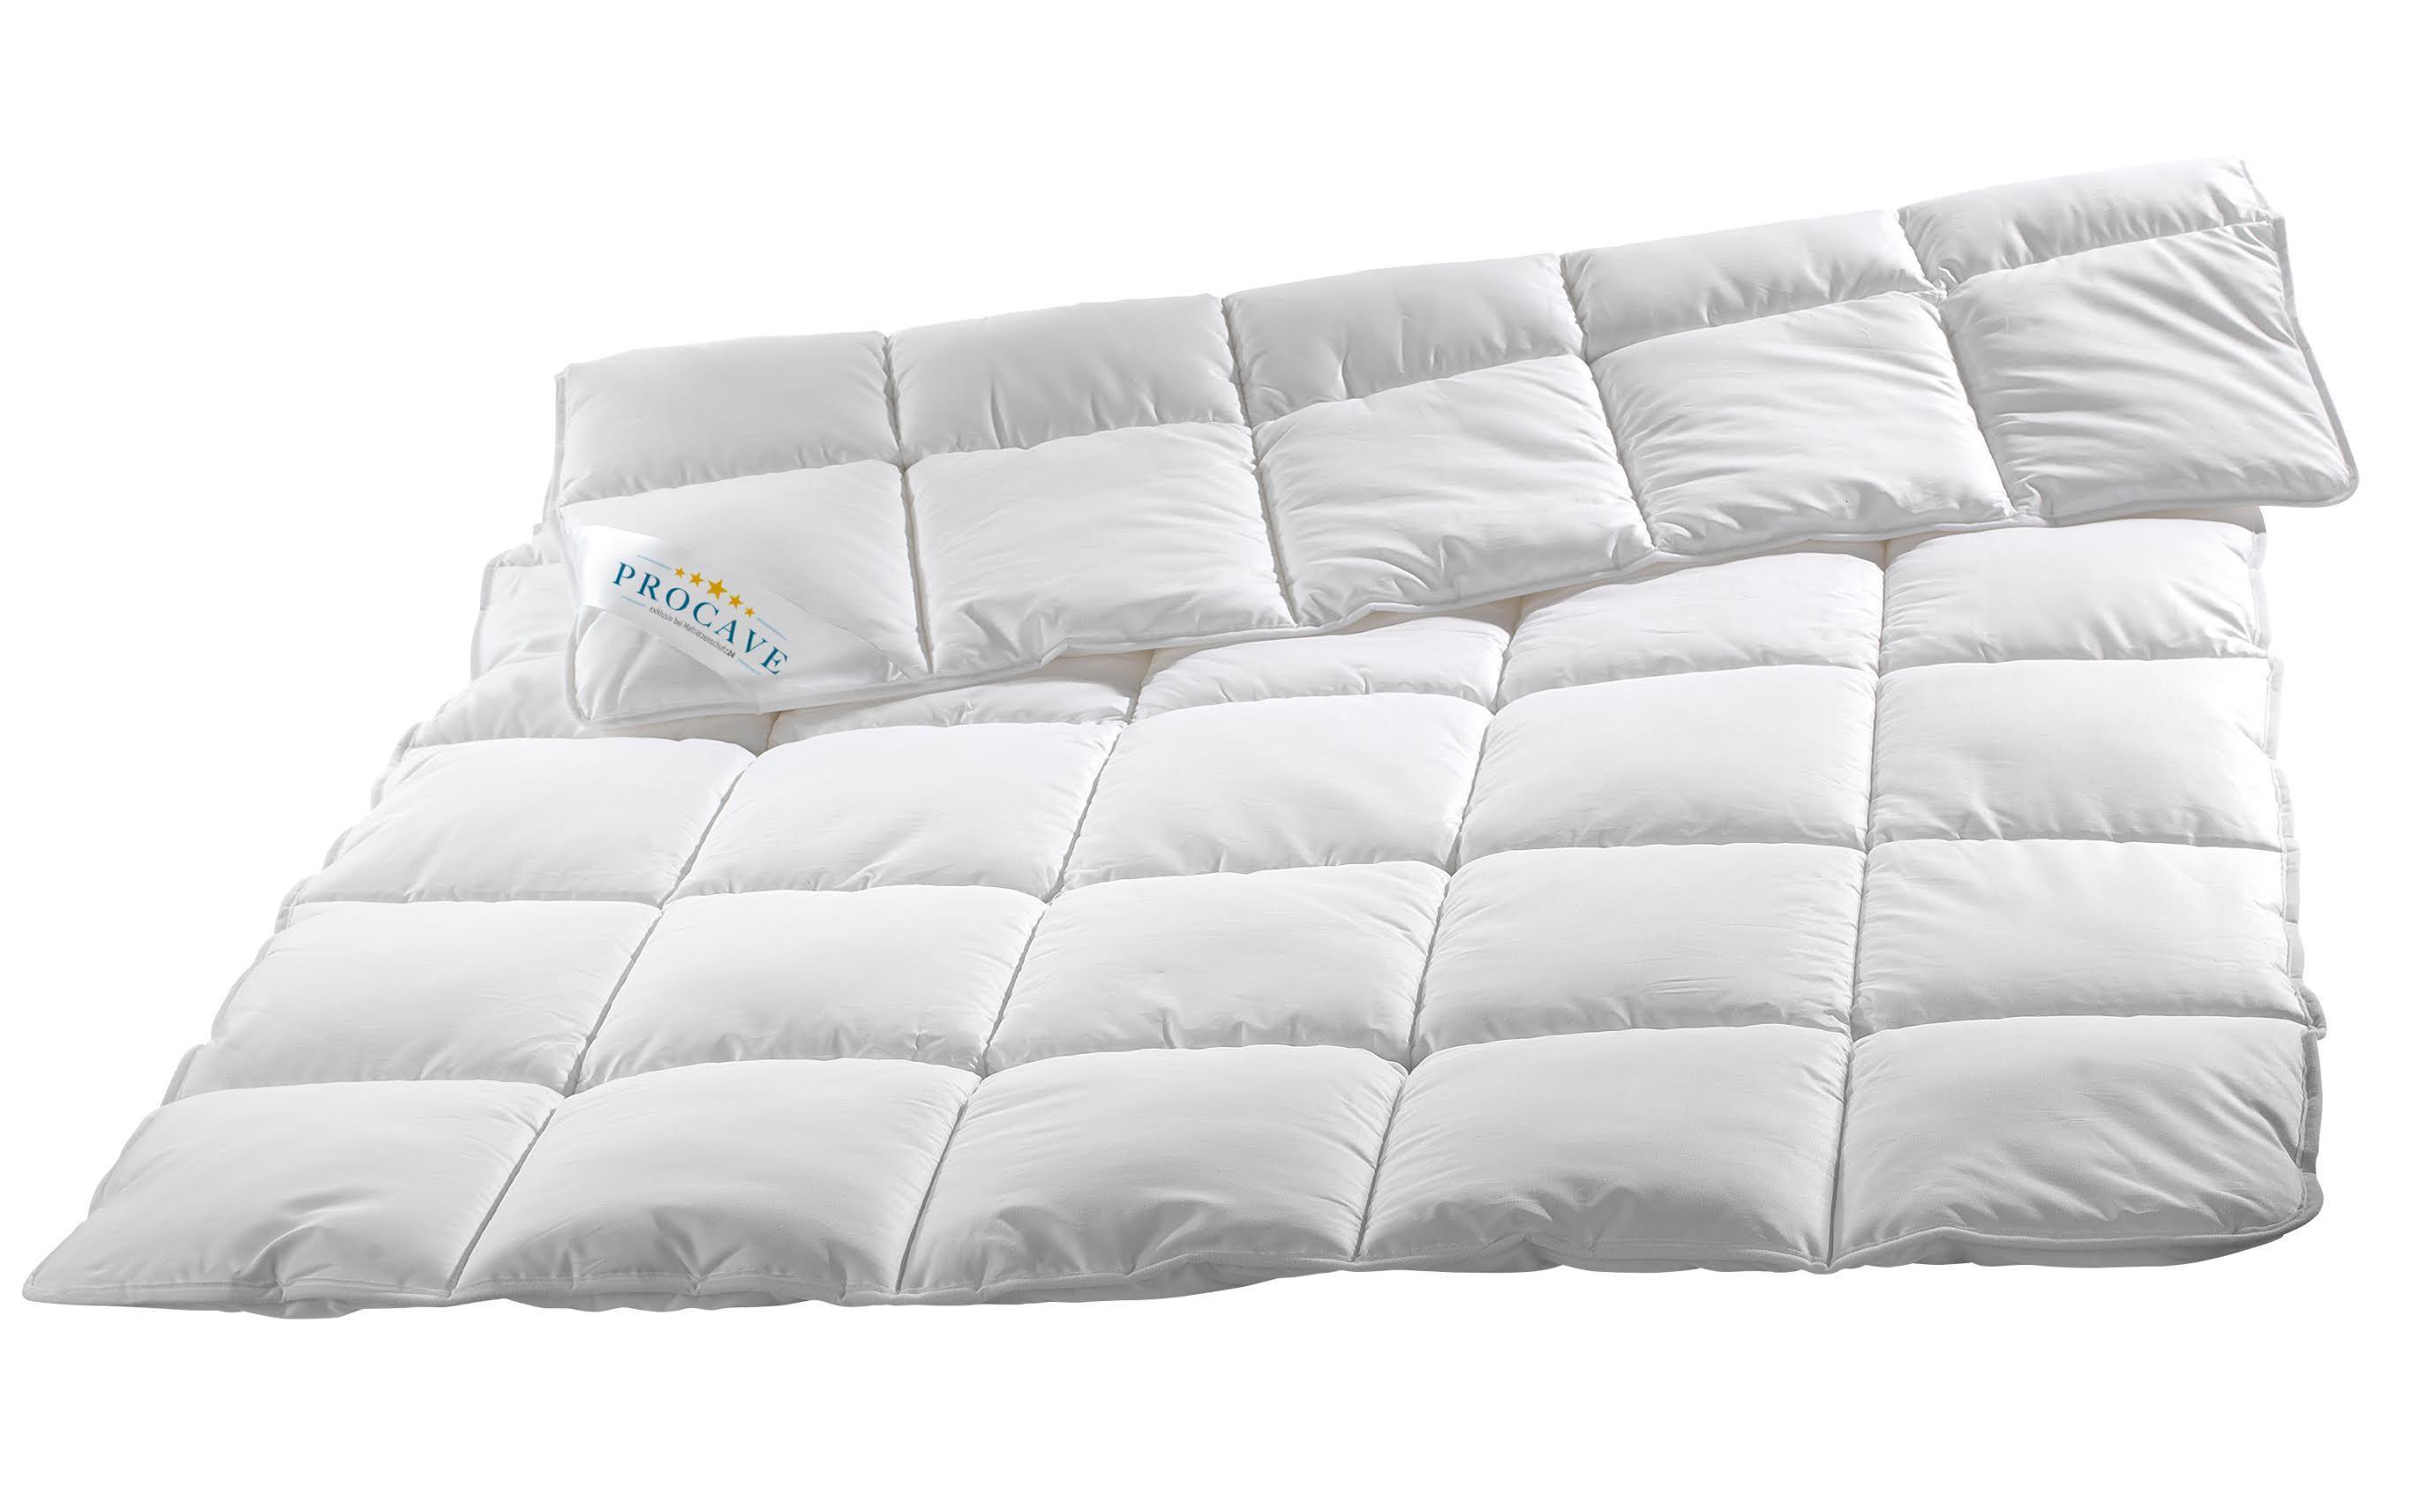 Bettdecken Danisches Bettenlager Microfaser Sommer Steppbett